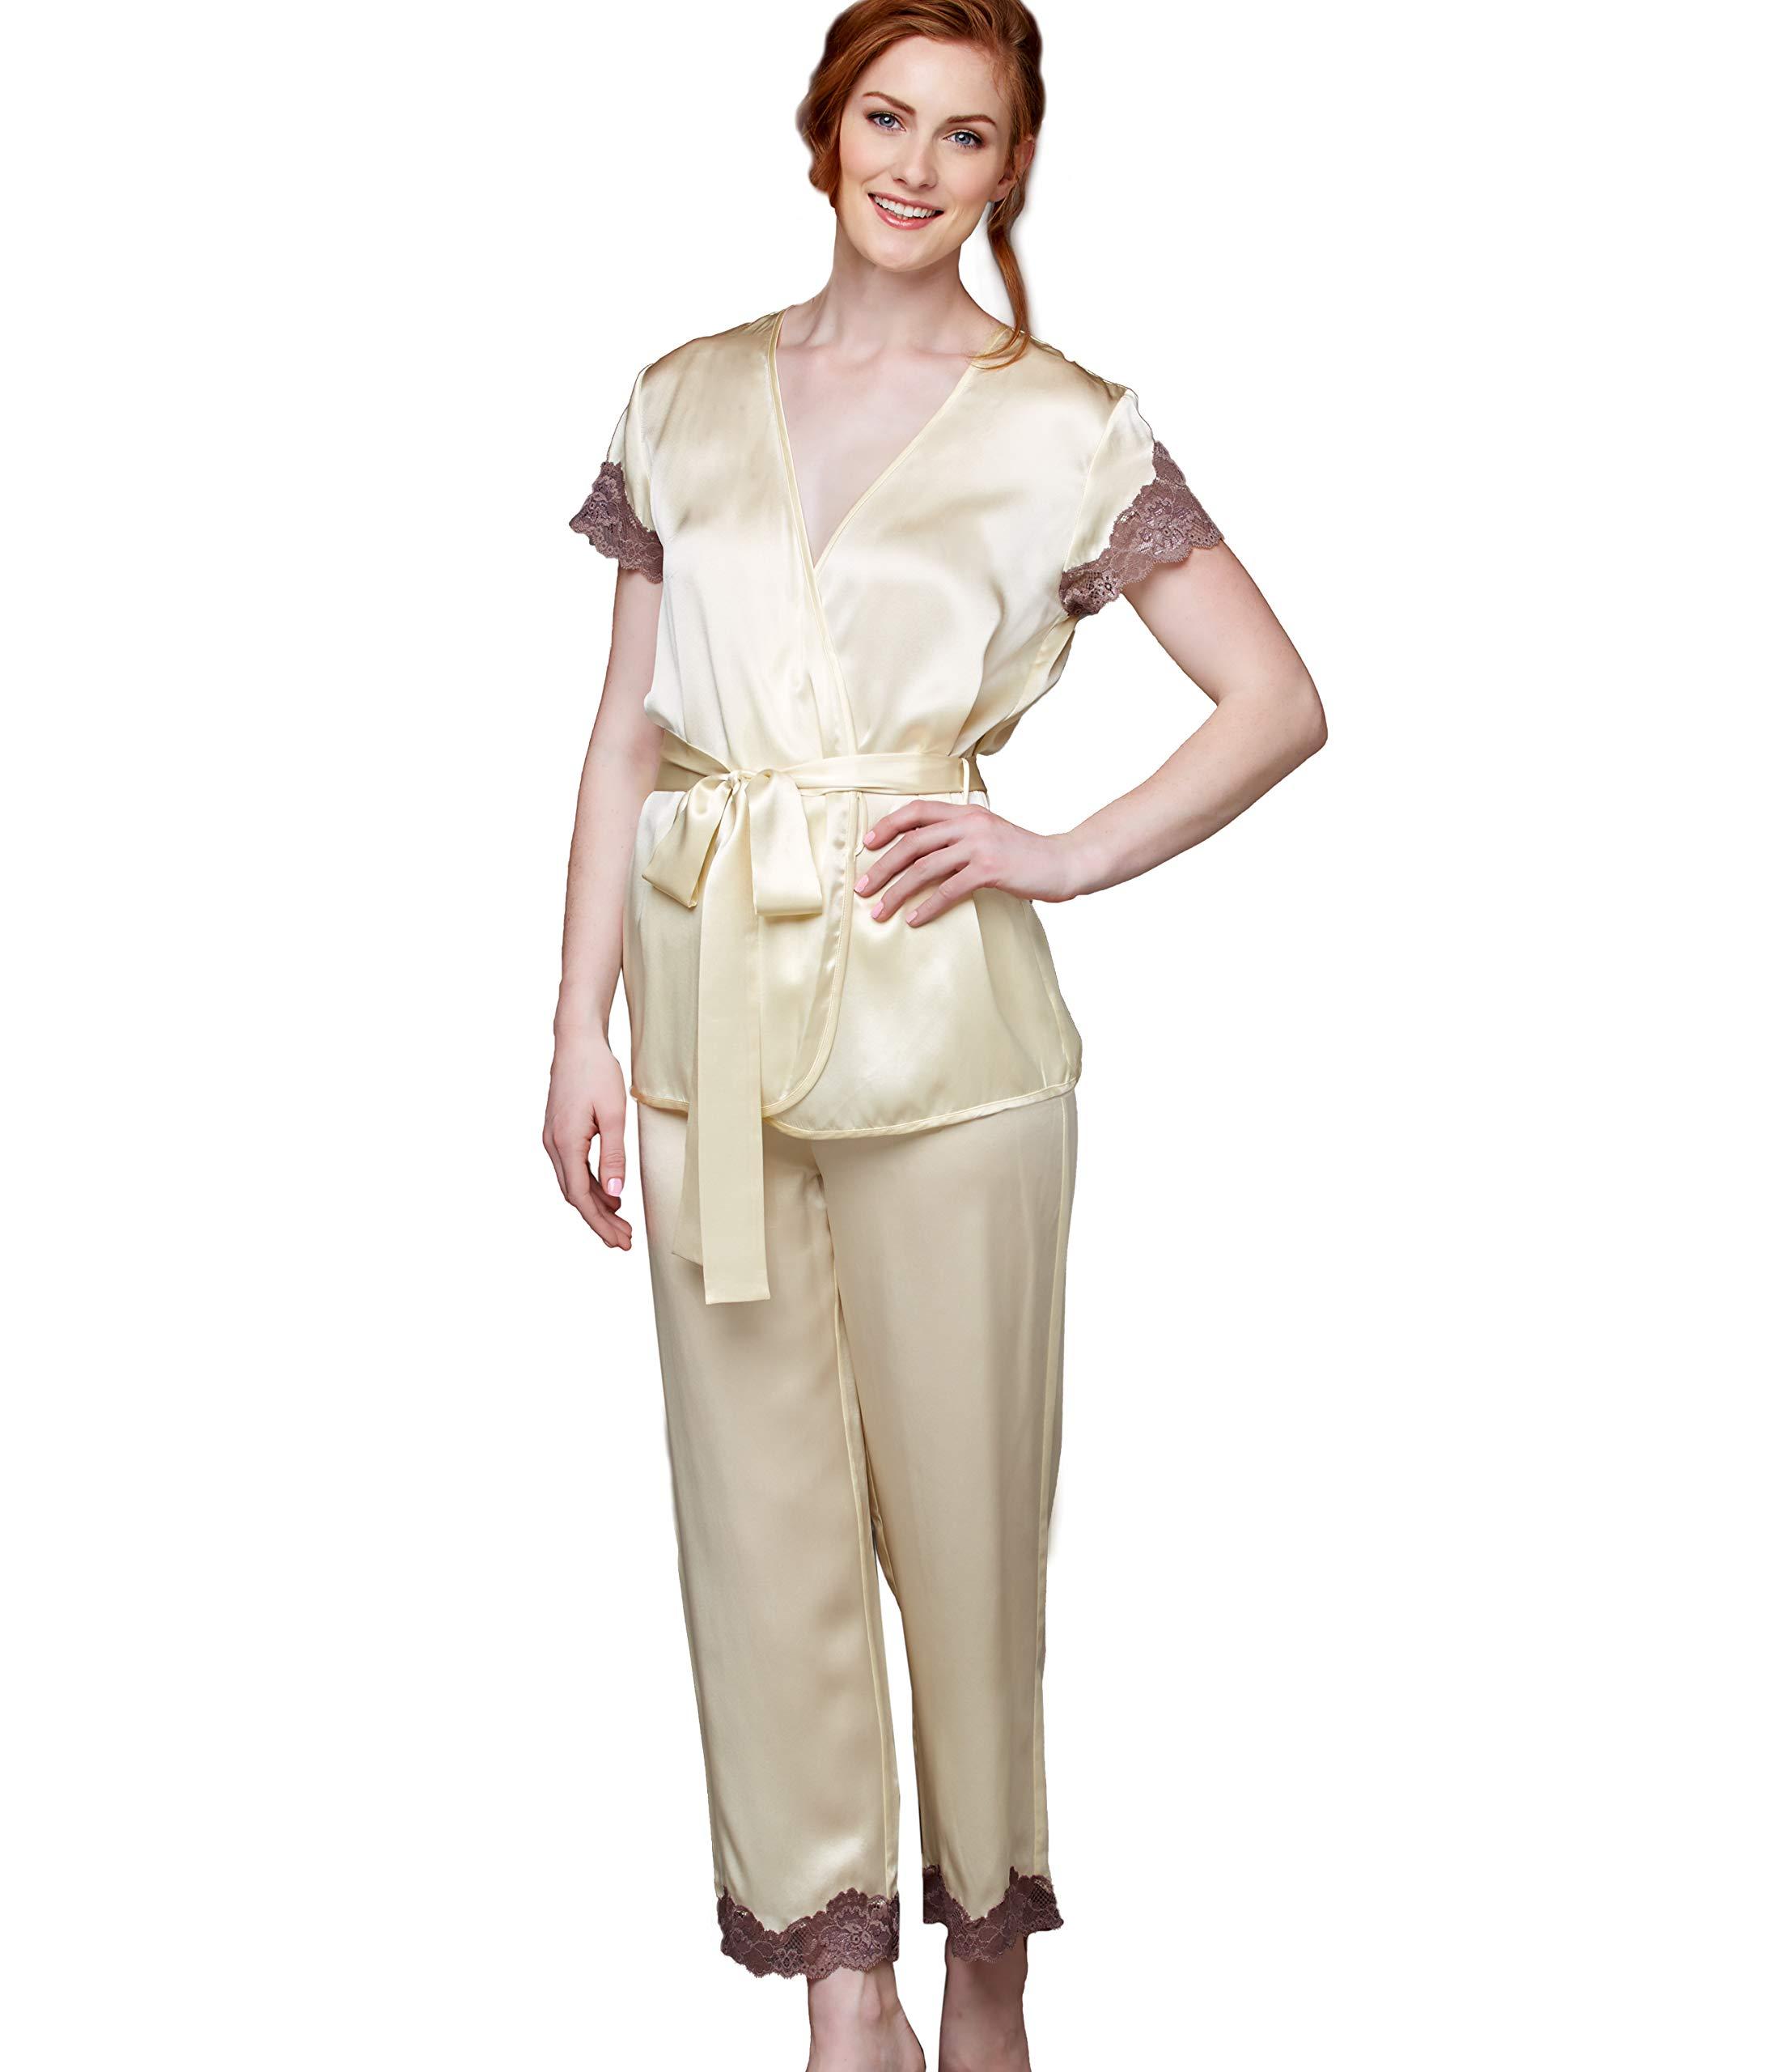 Julianna Rae Island Time Women's 100% Silk Wrap Pajama, Sleepwear, Lingerie, Beautiful Gift Packaging